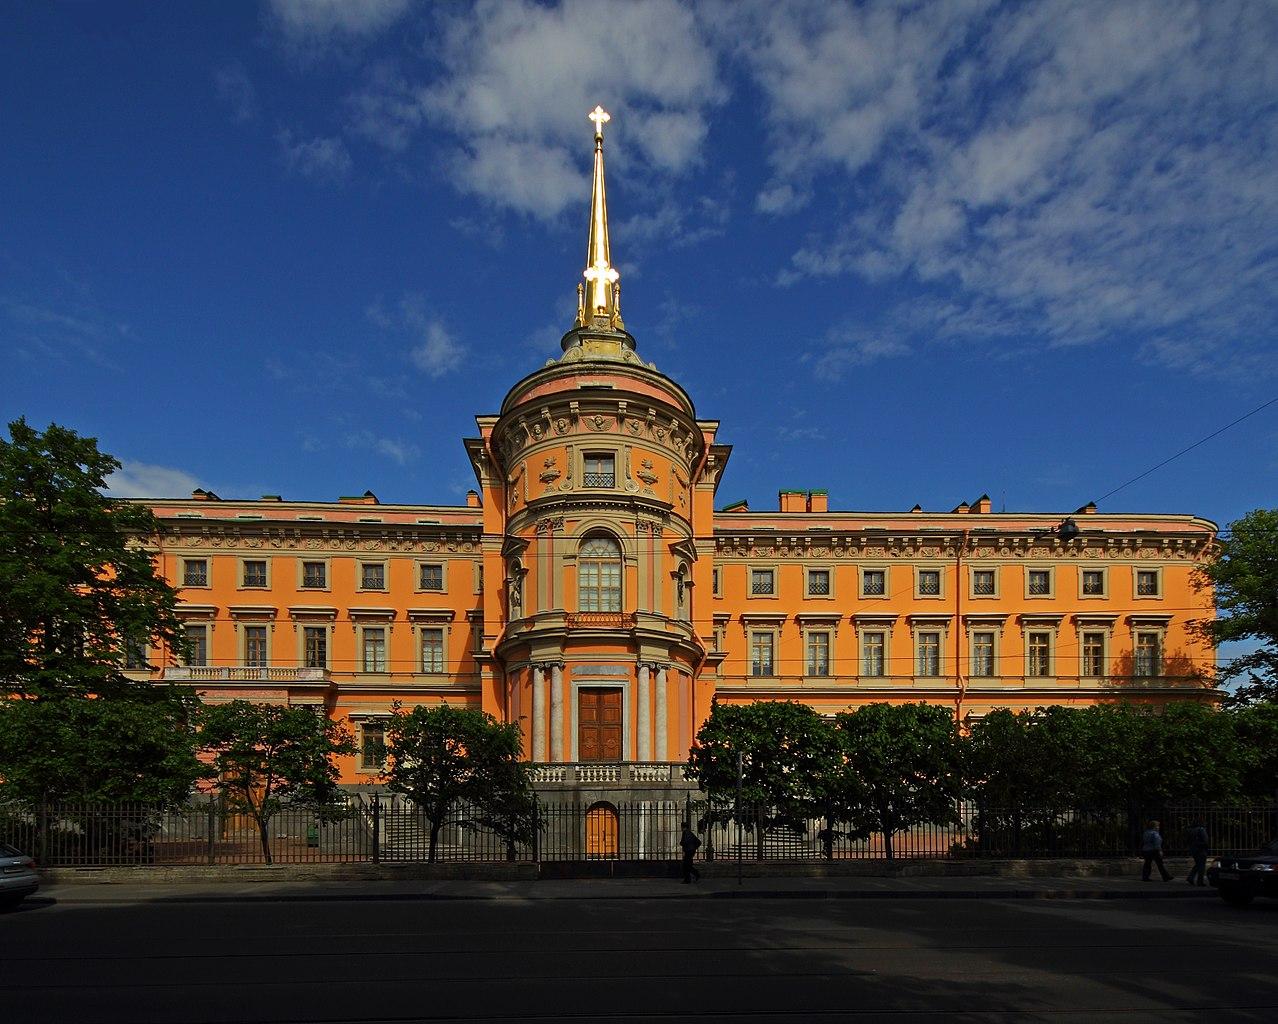 Михайловский (Инженерный) замок. Фасад на Садовую улицу. Фото: A.Savin (Wikimedia Commons · WikiPhotoSpace)